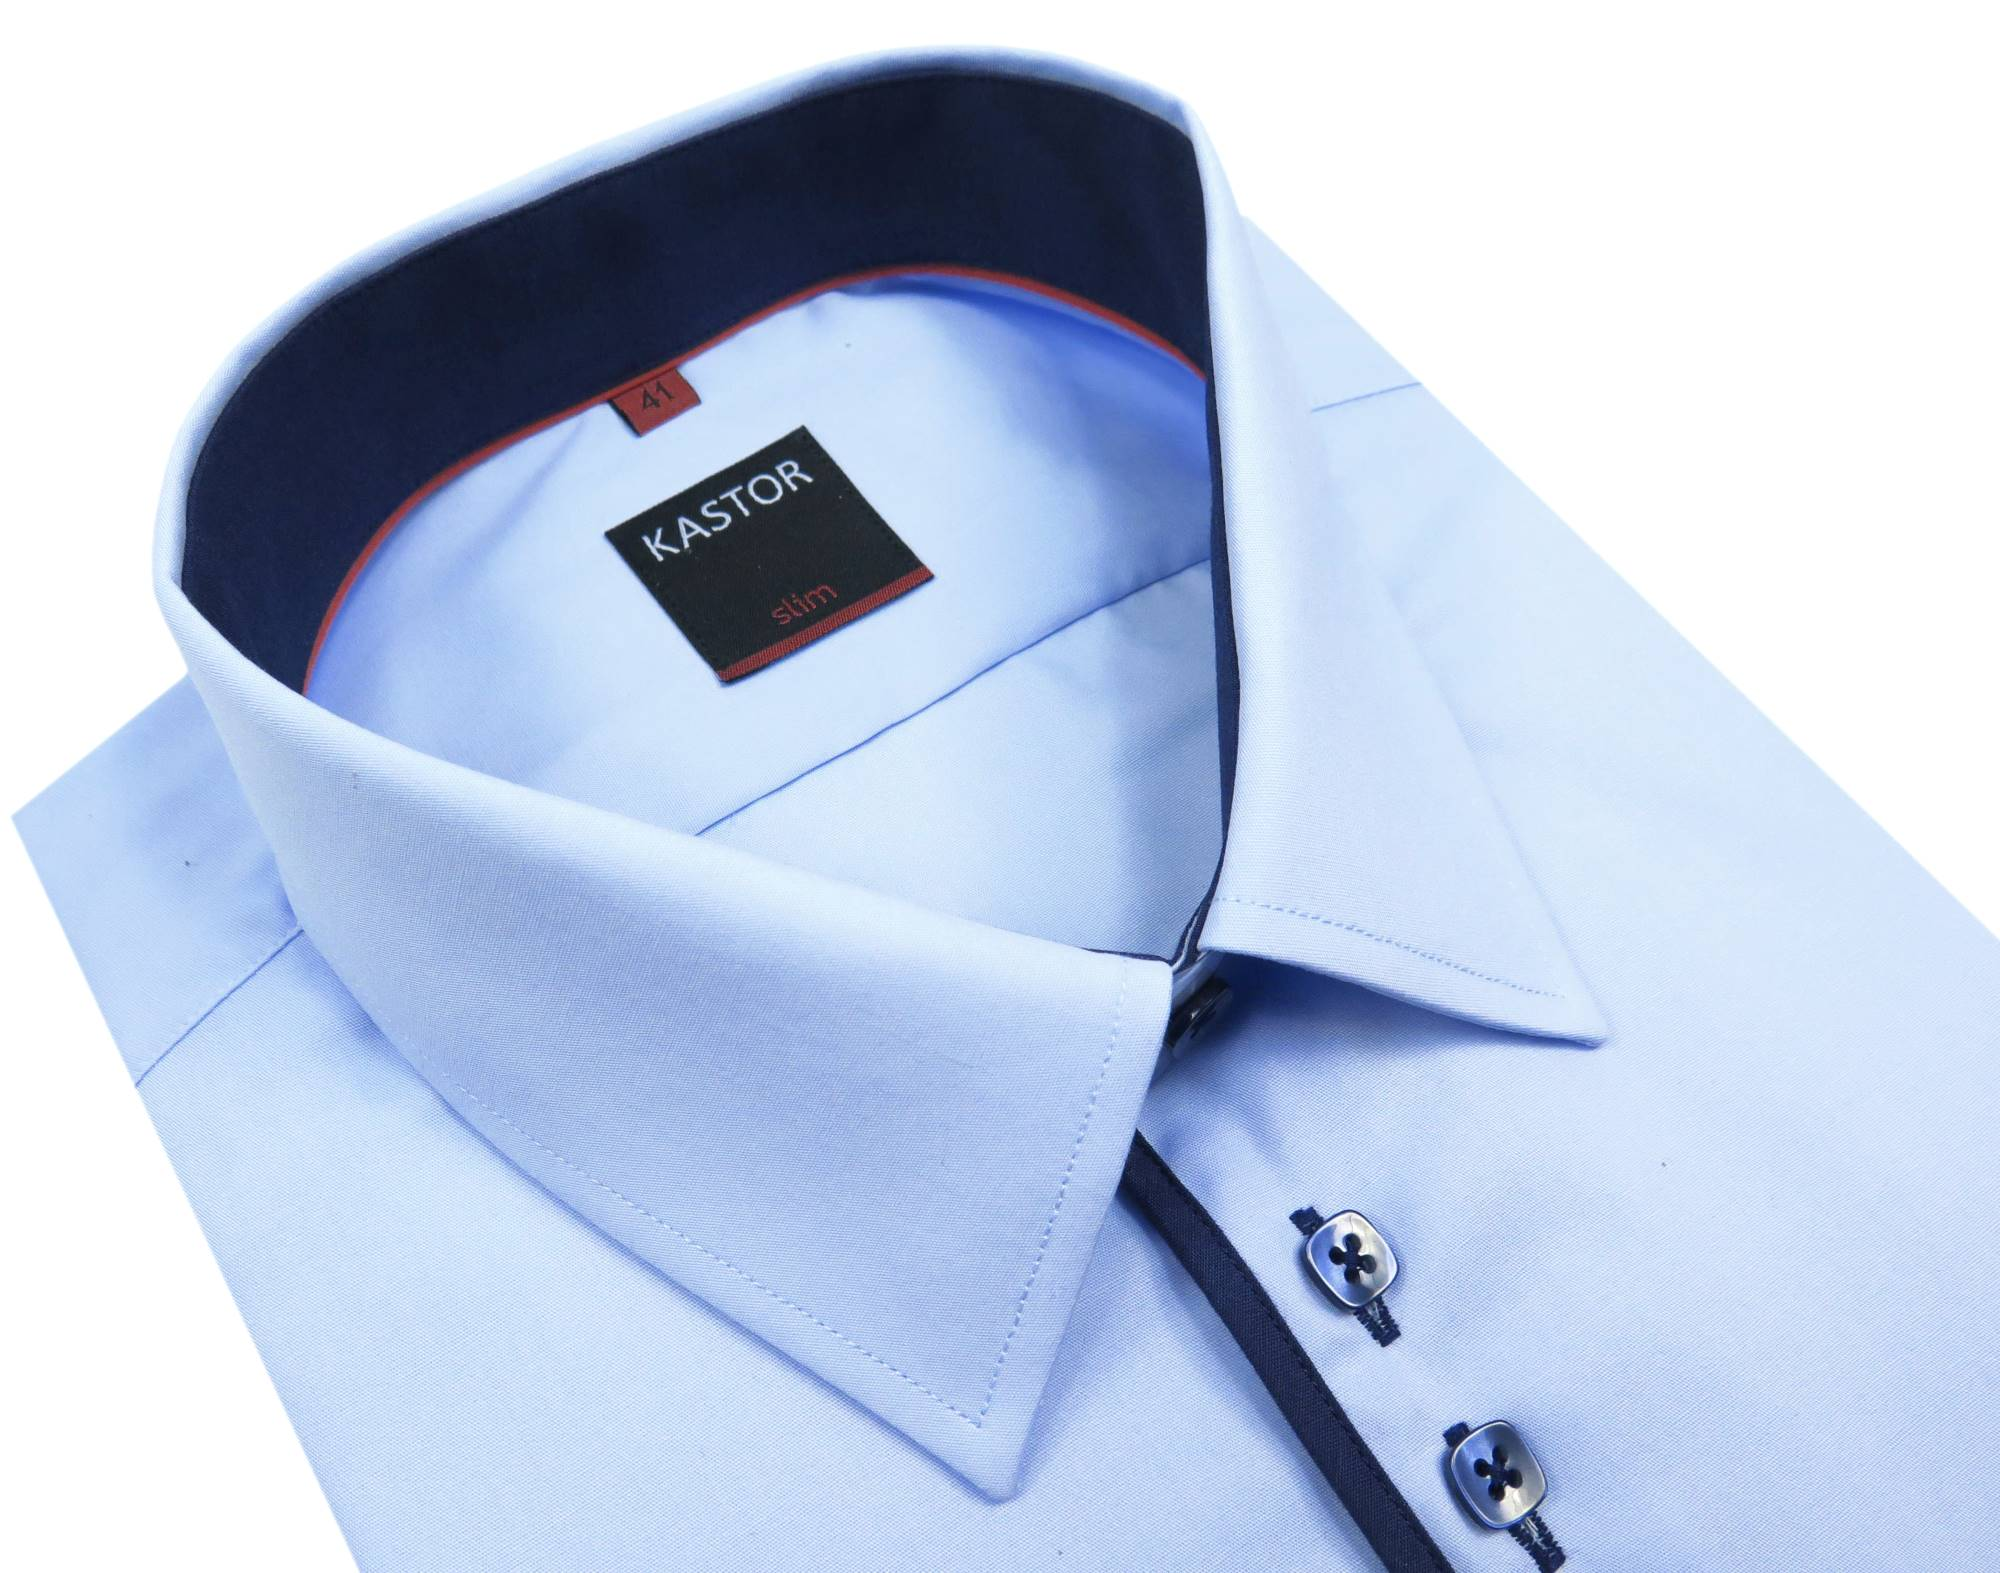 Błękitna koszula KAstor